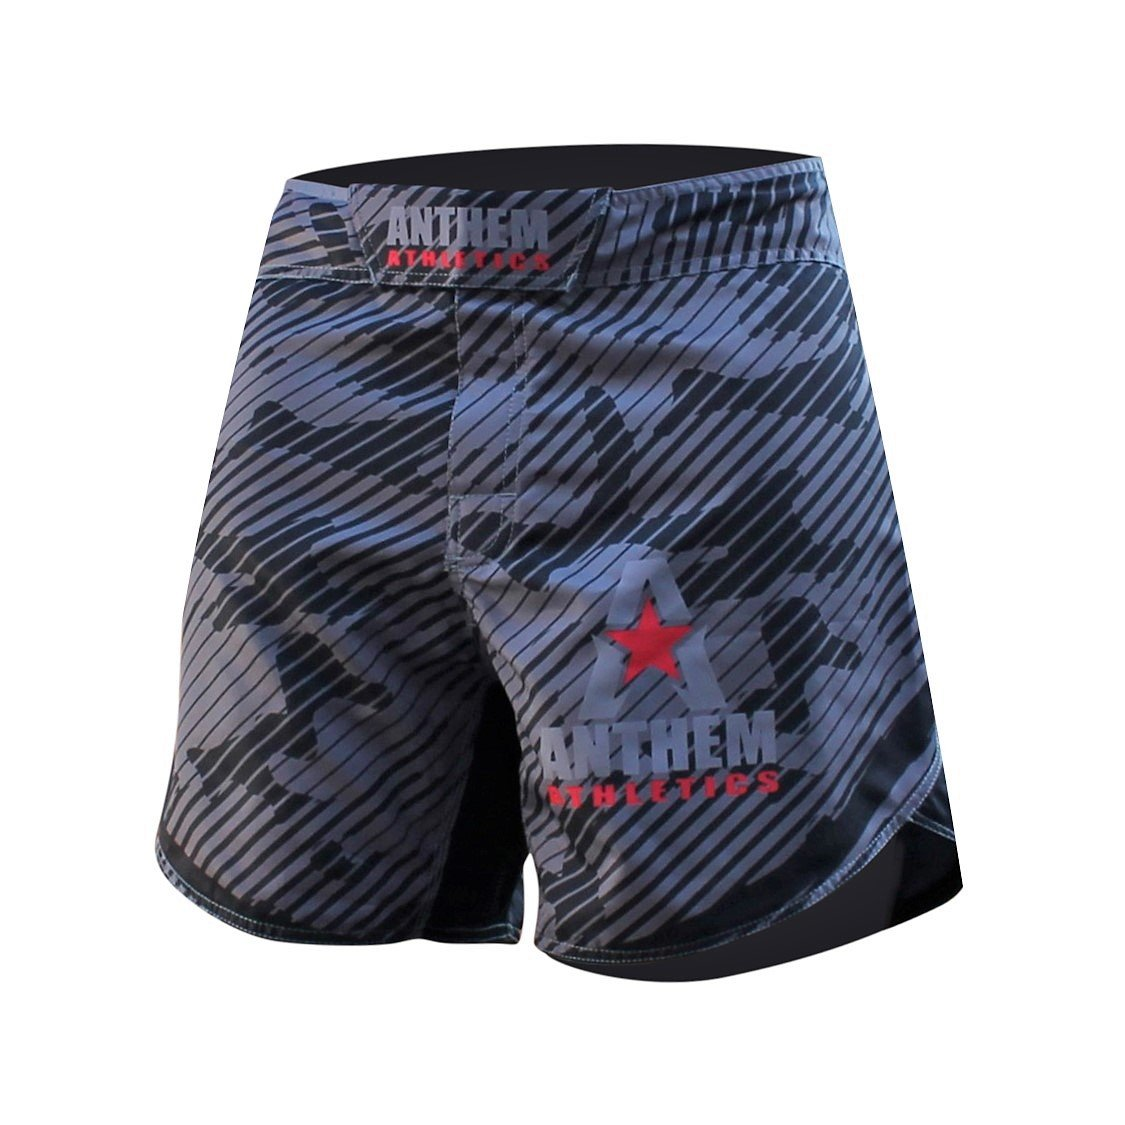 f042a7d049889 Anthem Athletics NEW COLORS DEFIANCE Kickboxing Short MMA Shorts - Muay  Thai, BJJ, WOD